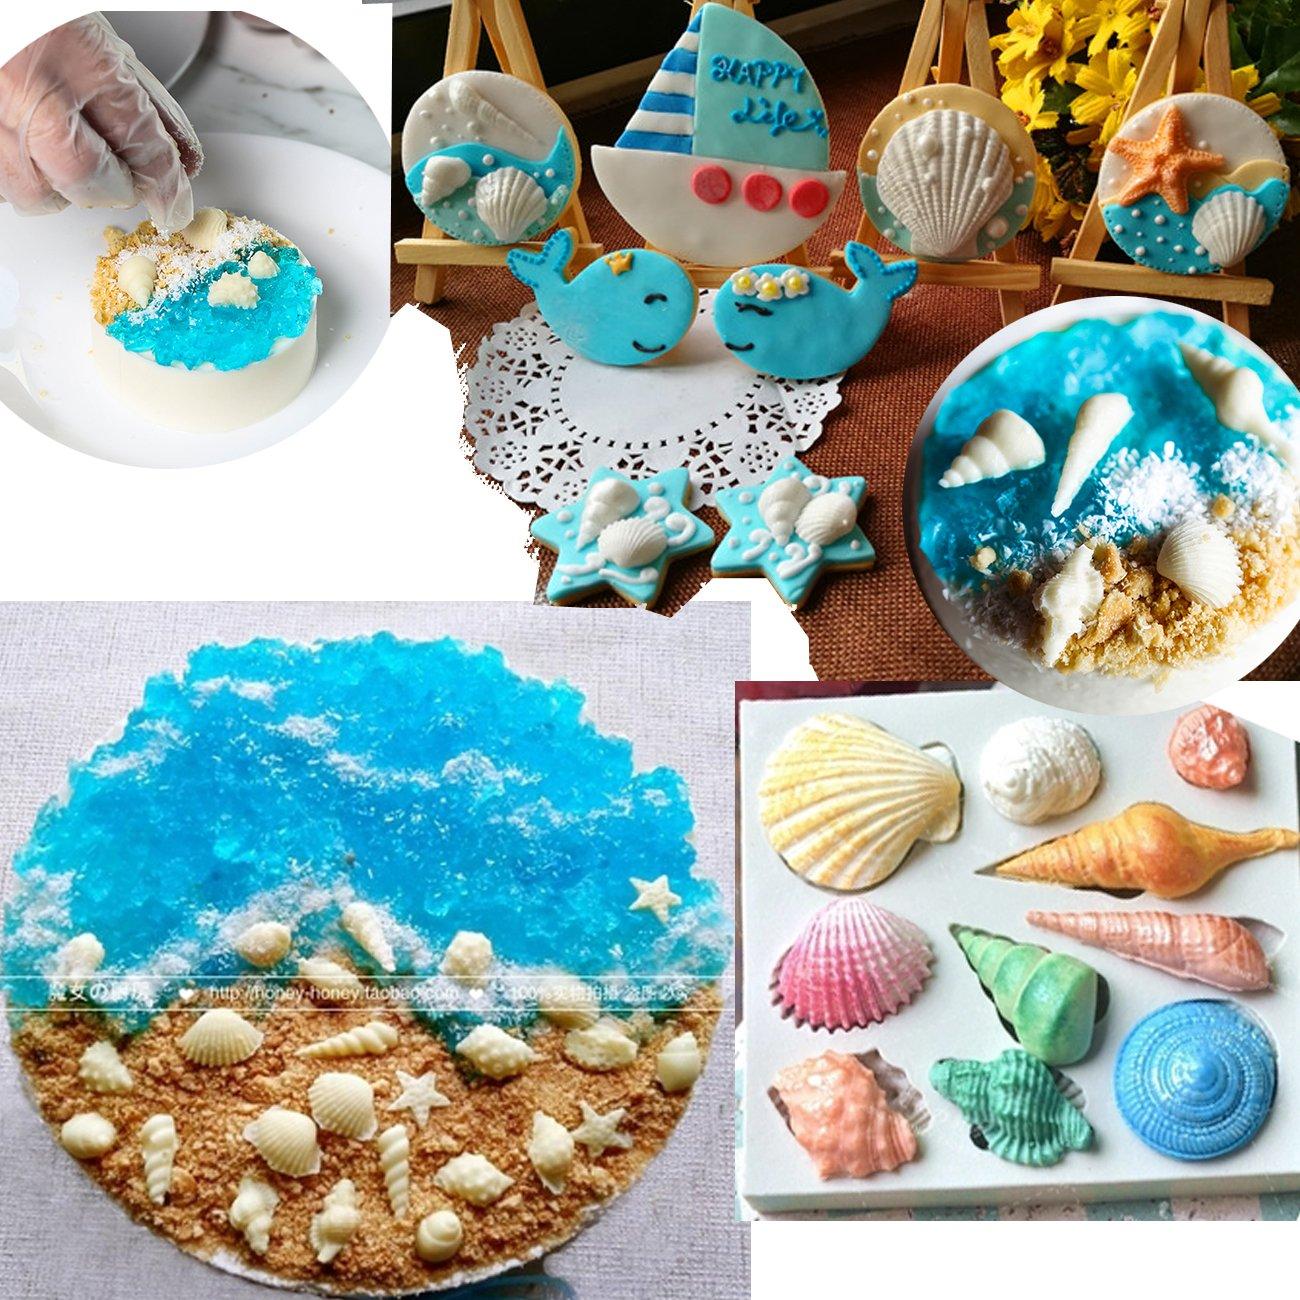 Anyana mini Sea Shell Conch scallop starfish silicone mould beach cake Fondant gum paste mold for Sugar paste birthday party cupcake decorating topper decoration sugarcraft decor set of 2